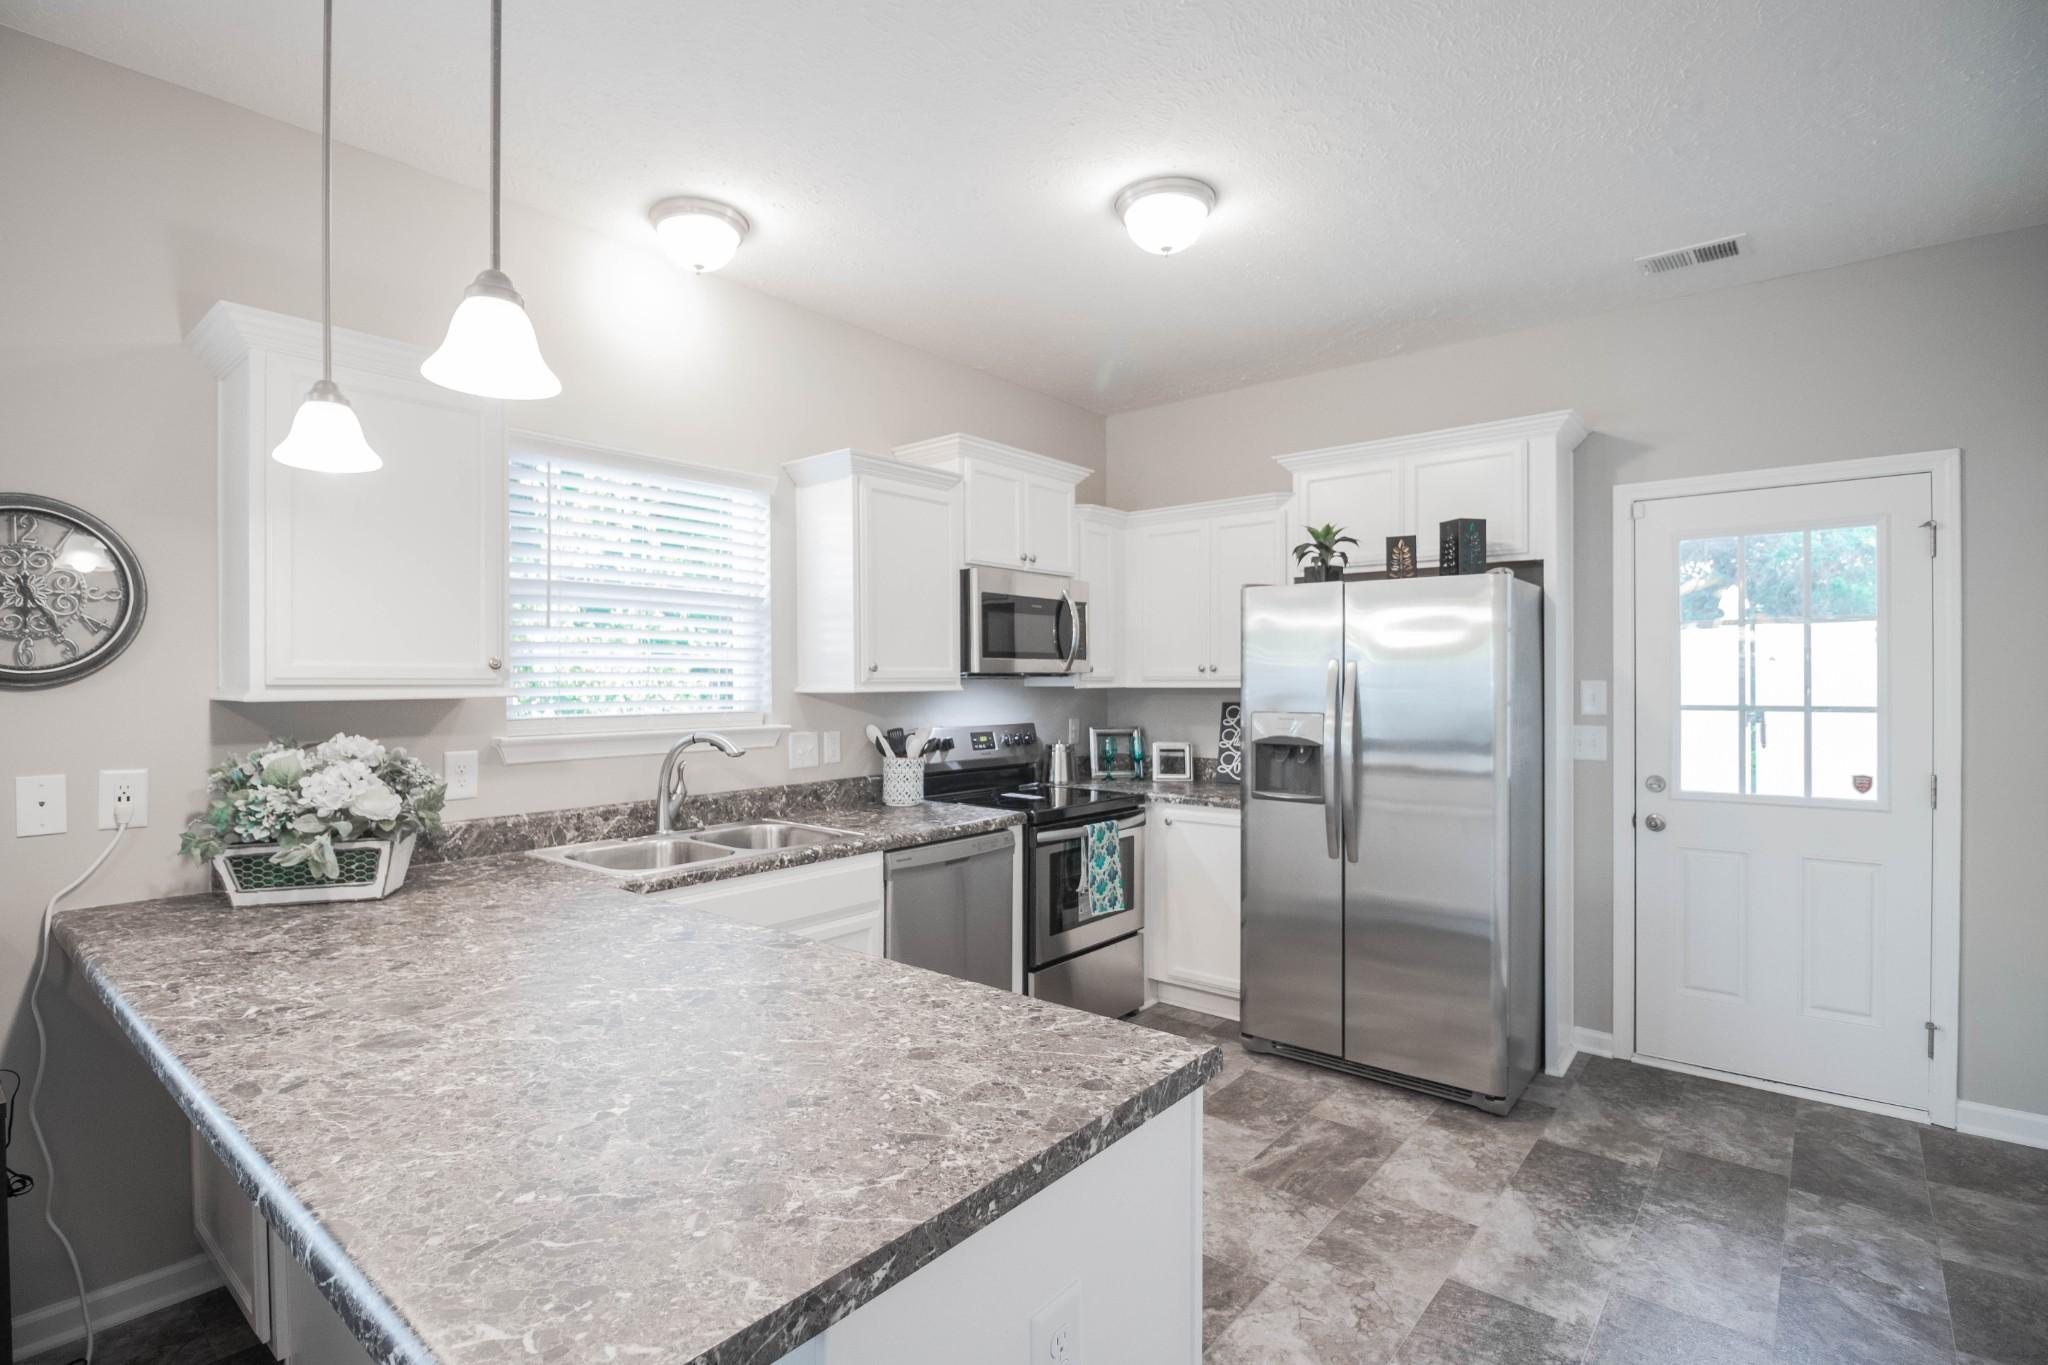 5878 Monroe Xing, Antioch, TN 37013 - Antioch, TN real estate listing